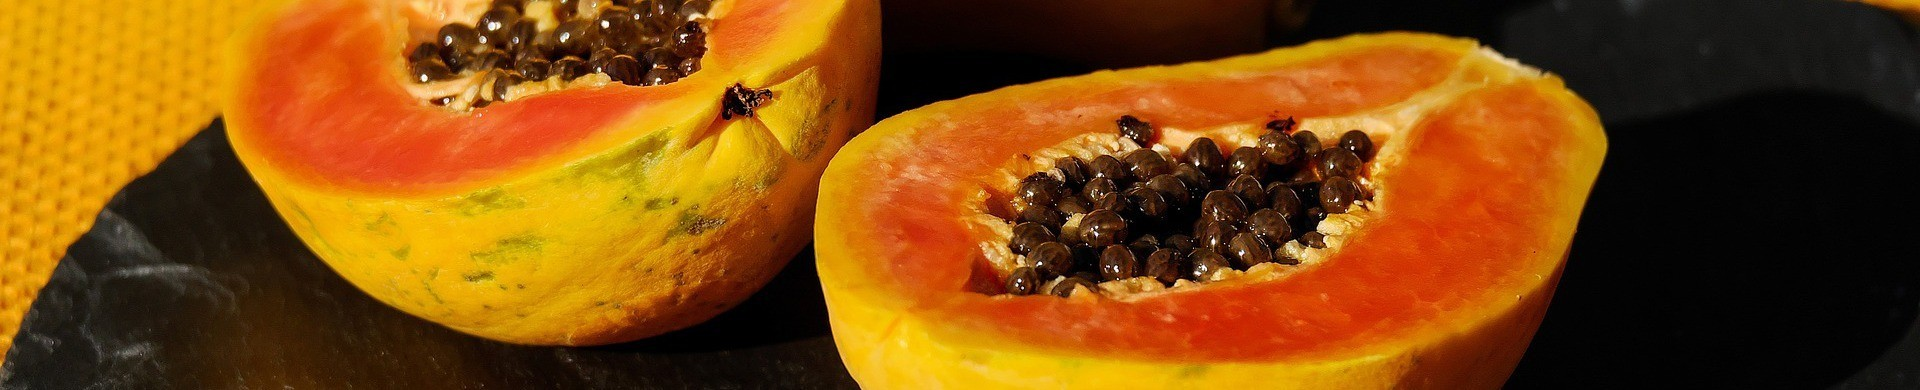 Tropical and Subtropical Fruits - Tropical Fruits